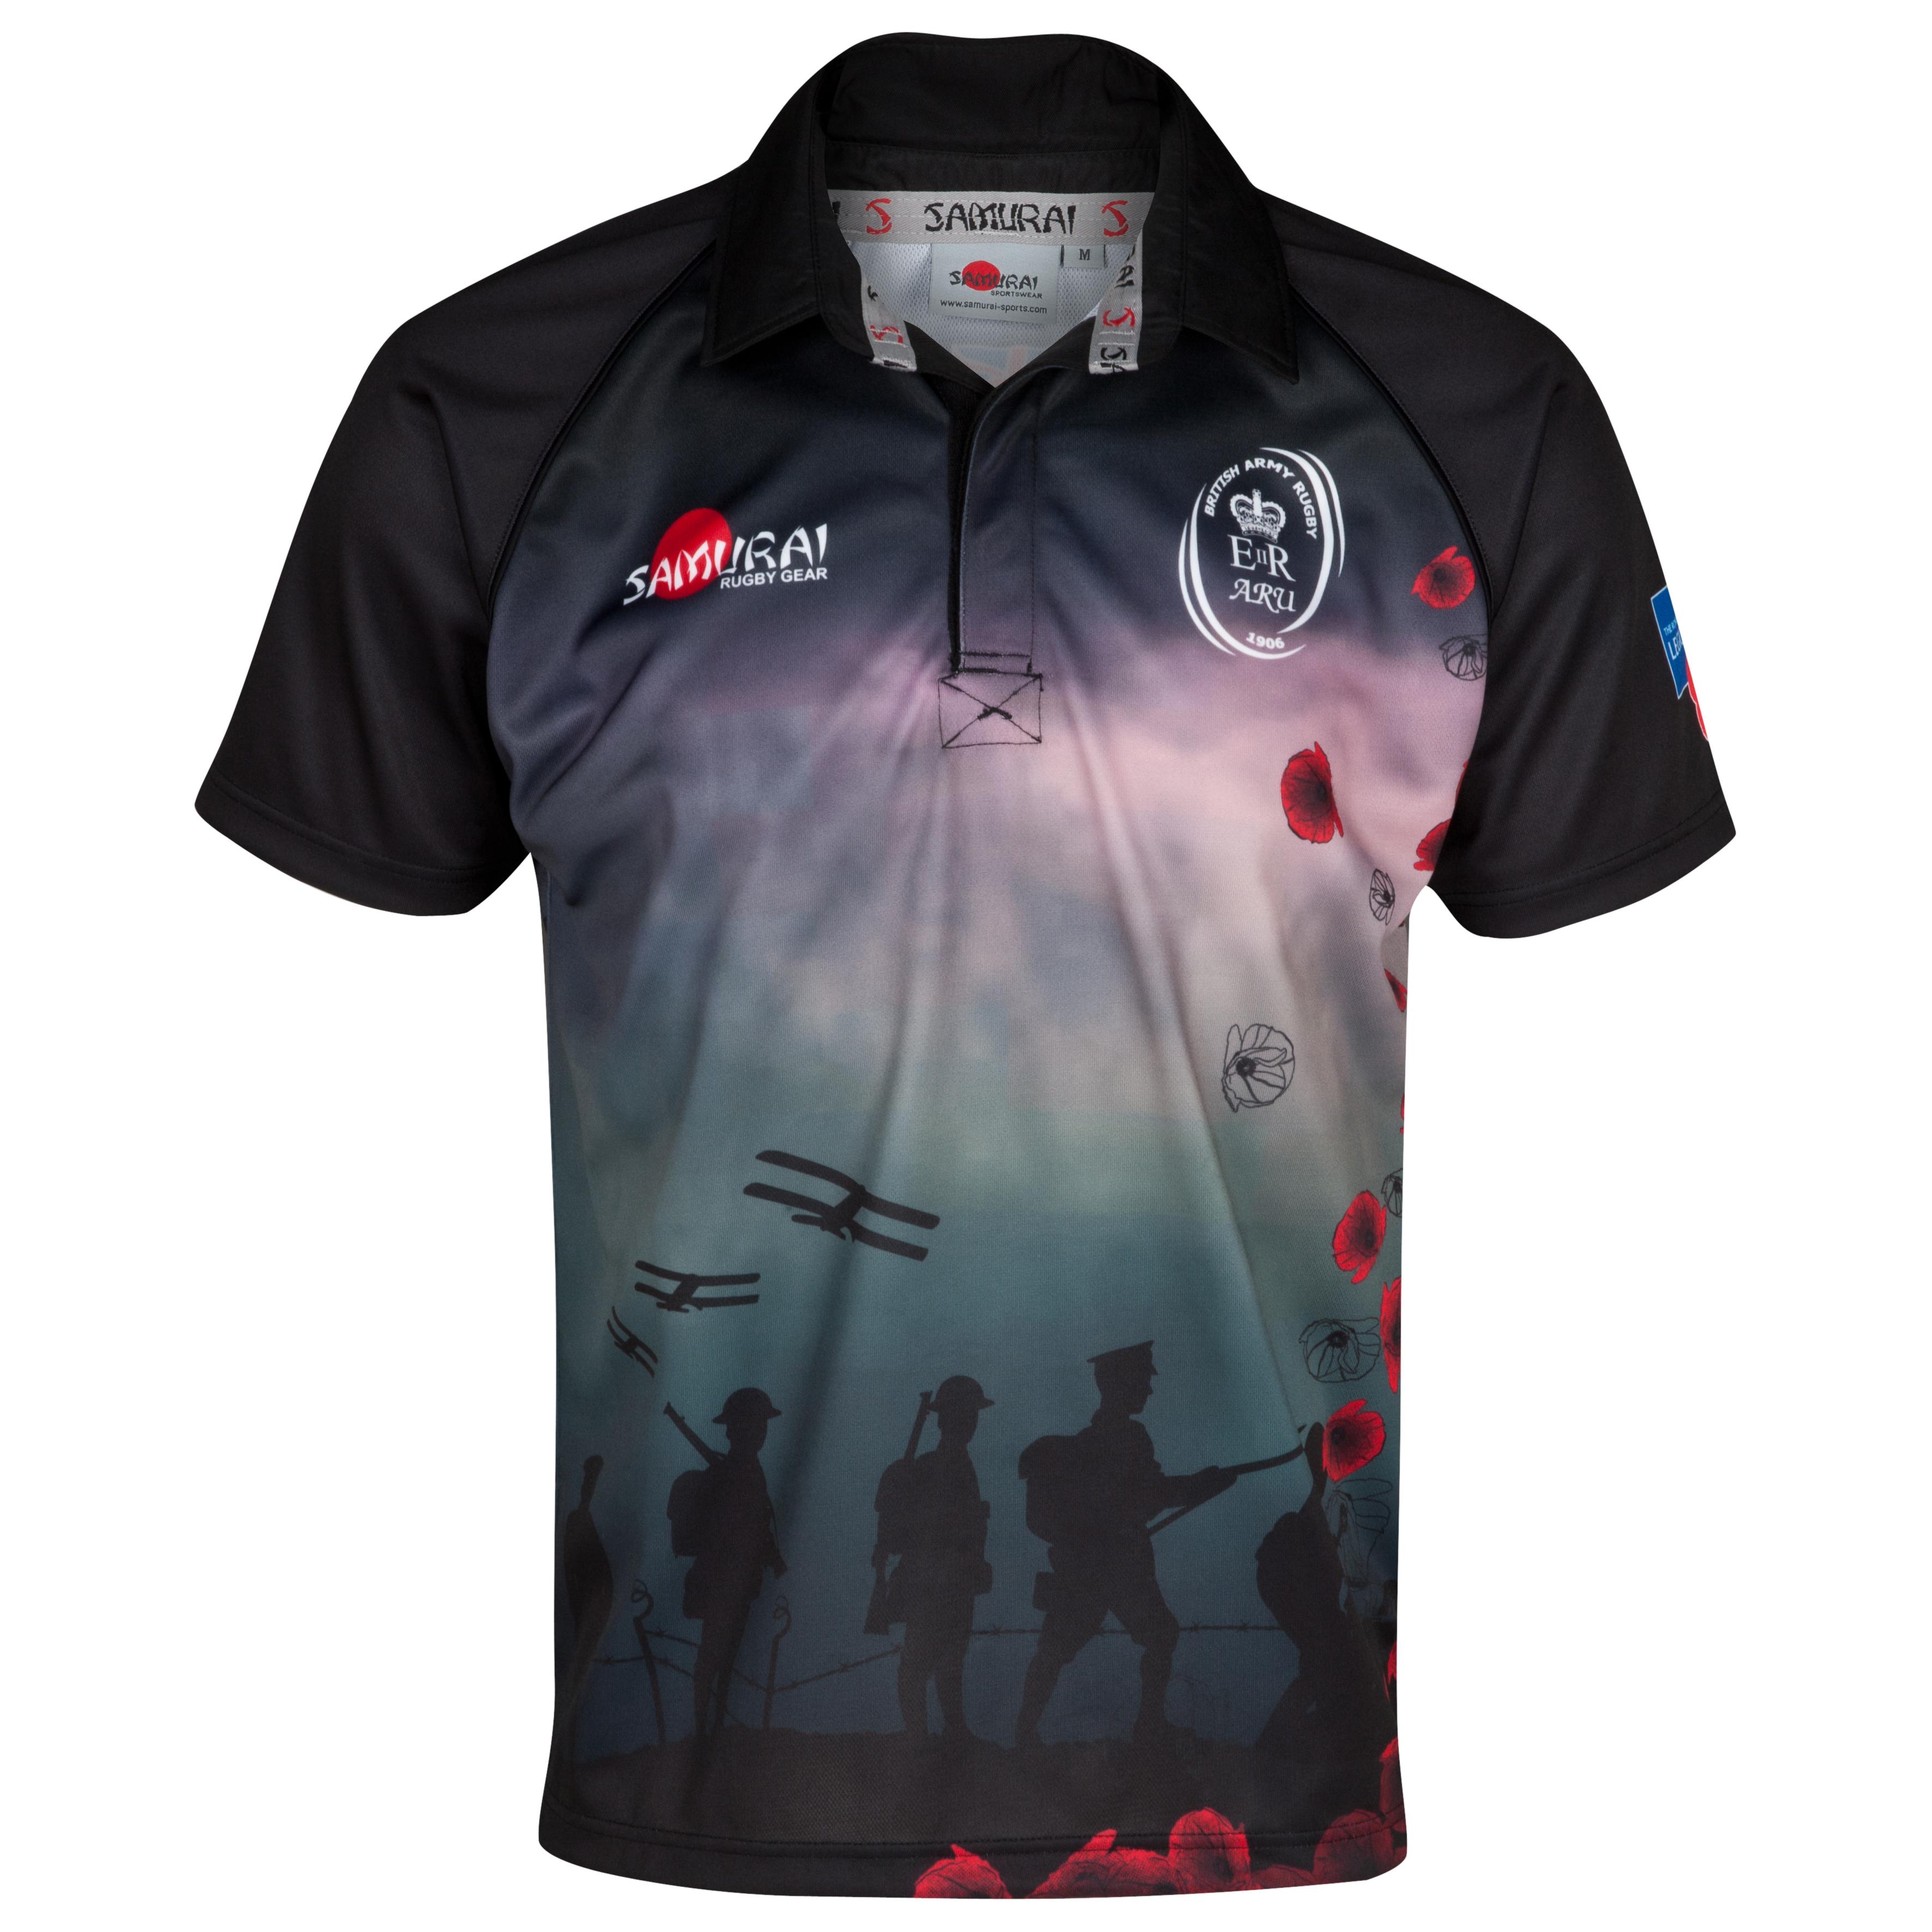 Army Rugby Union Poppy Shirt - Black/Red/Multi